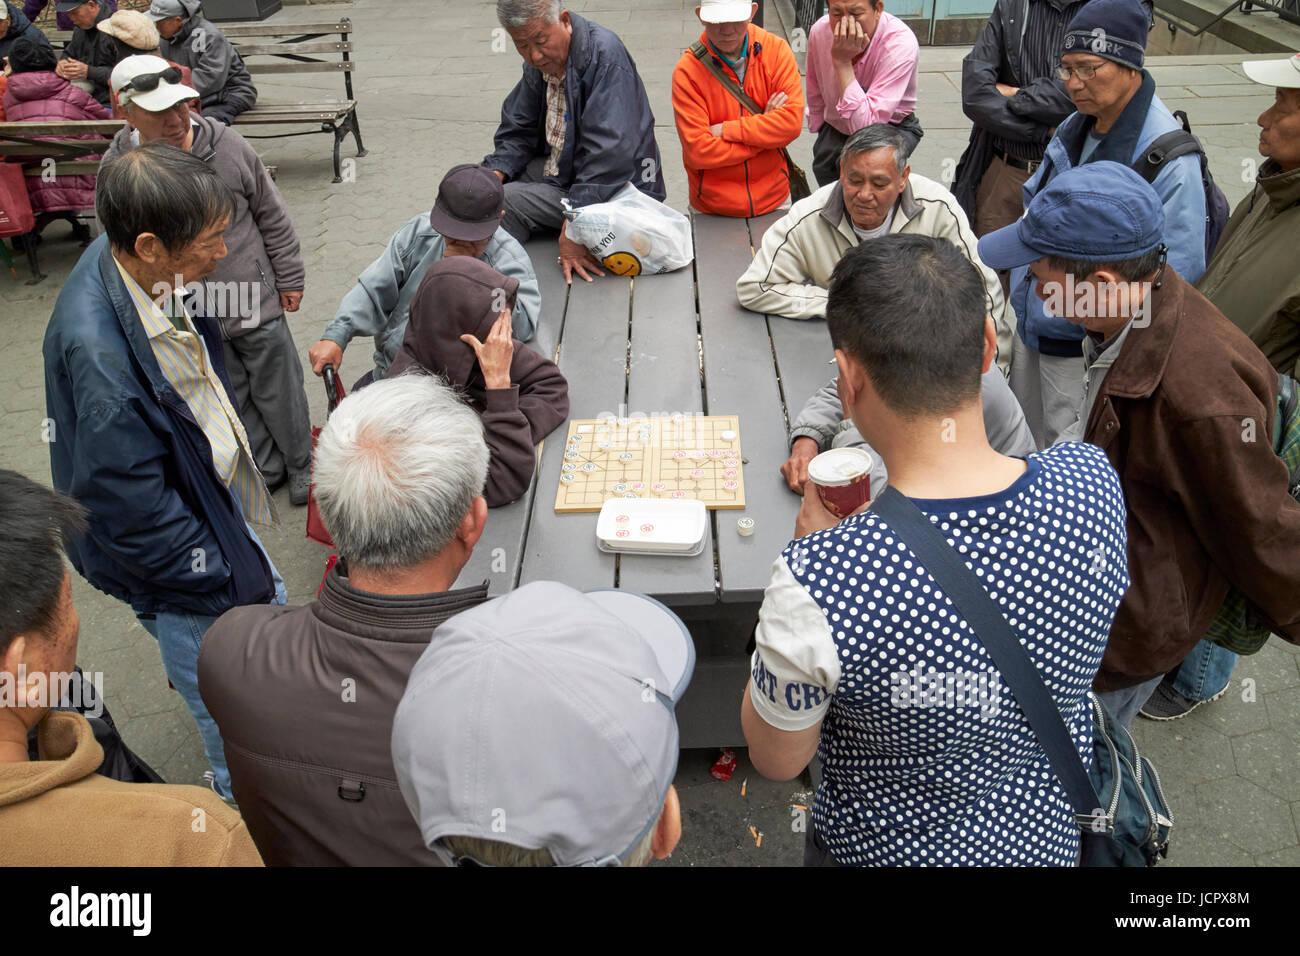 crowd watching two men play xiangqi chinese chess in columbus park chinatown New York City USA - Stock Image